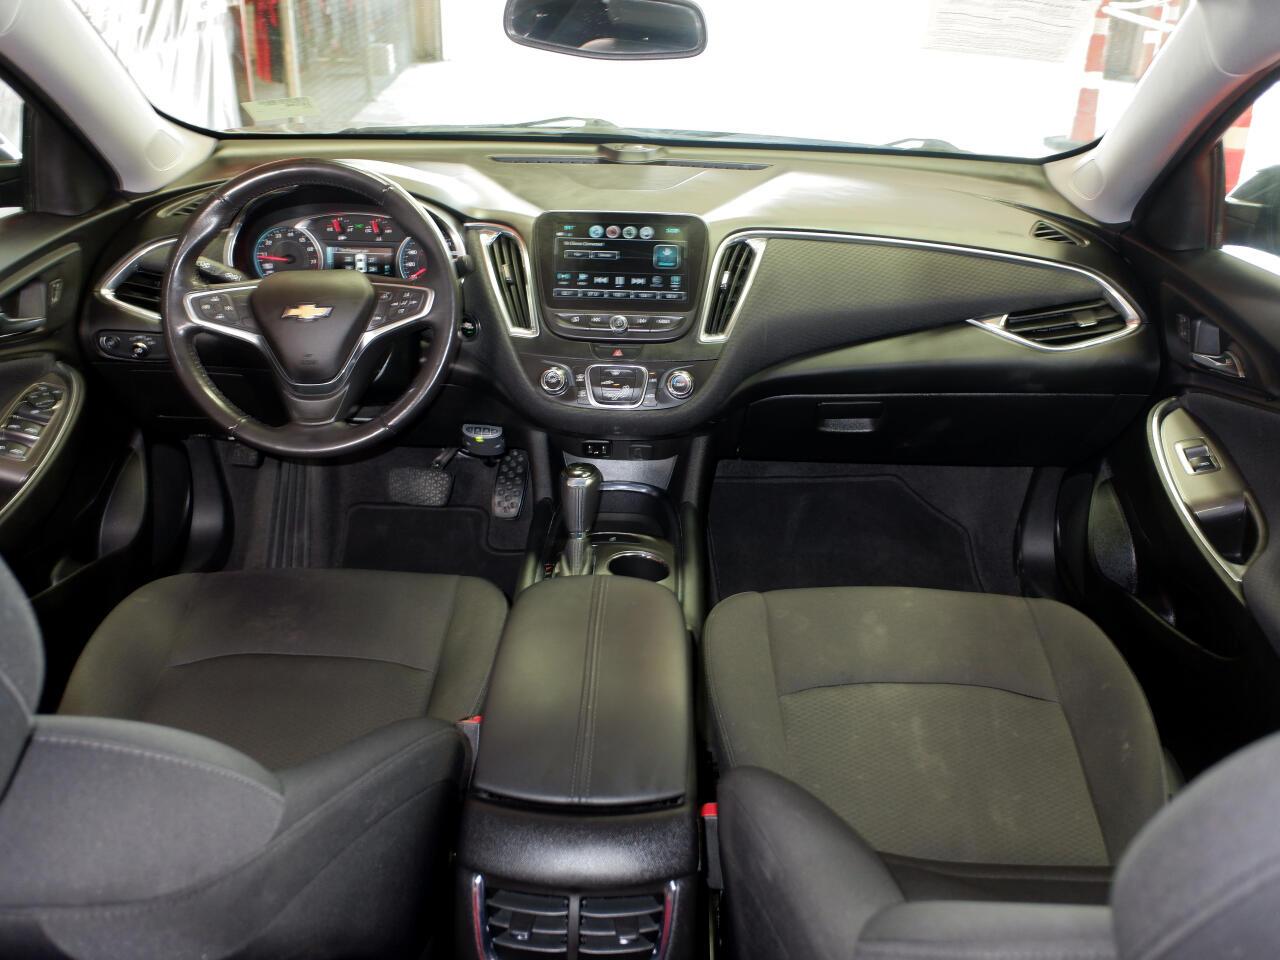 Chevrolet Malibu 4dr Sdn LT w/1LT 2018